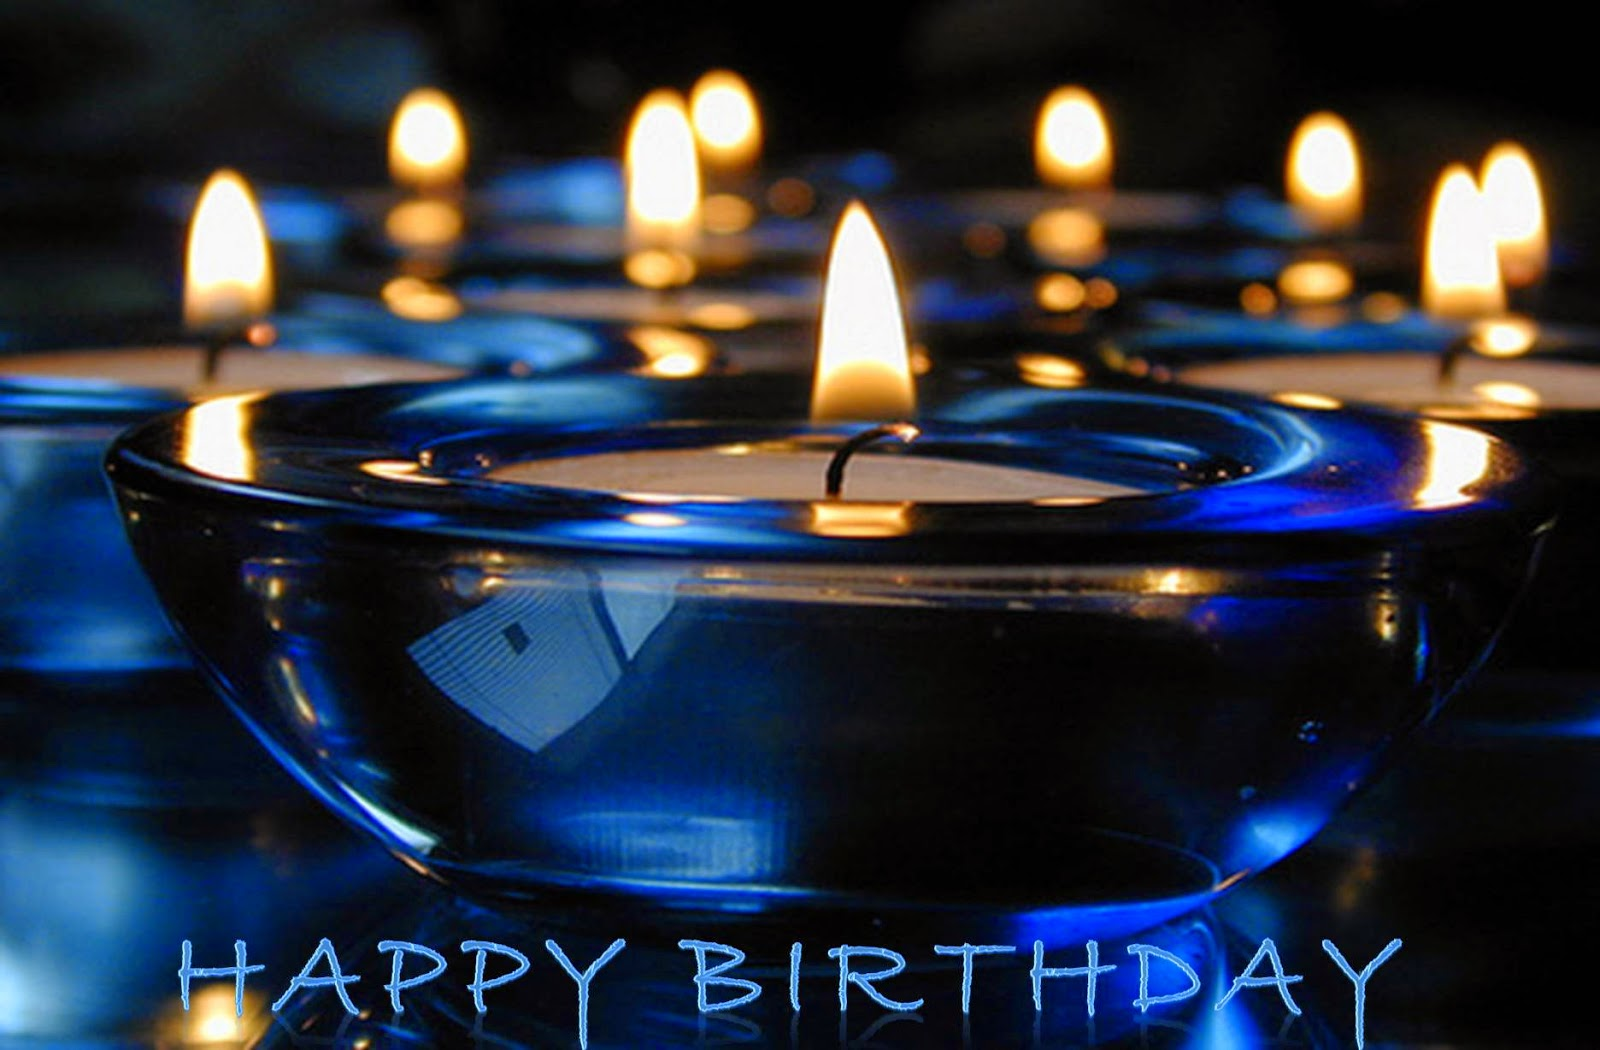 Top 10 Photo Gallery Happy Birthday To My Dear Friend Hd Wellpaper